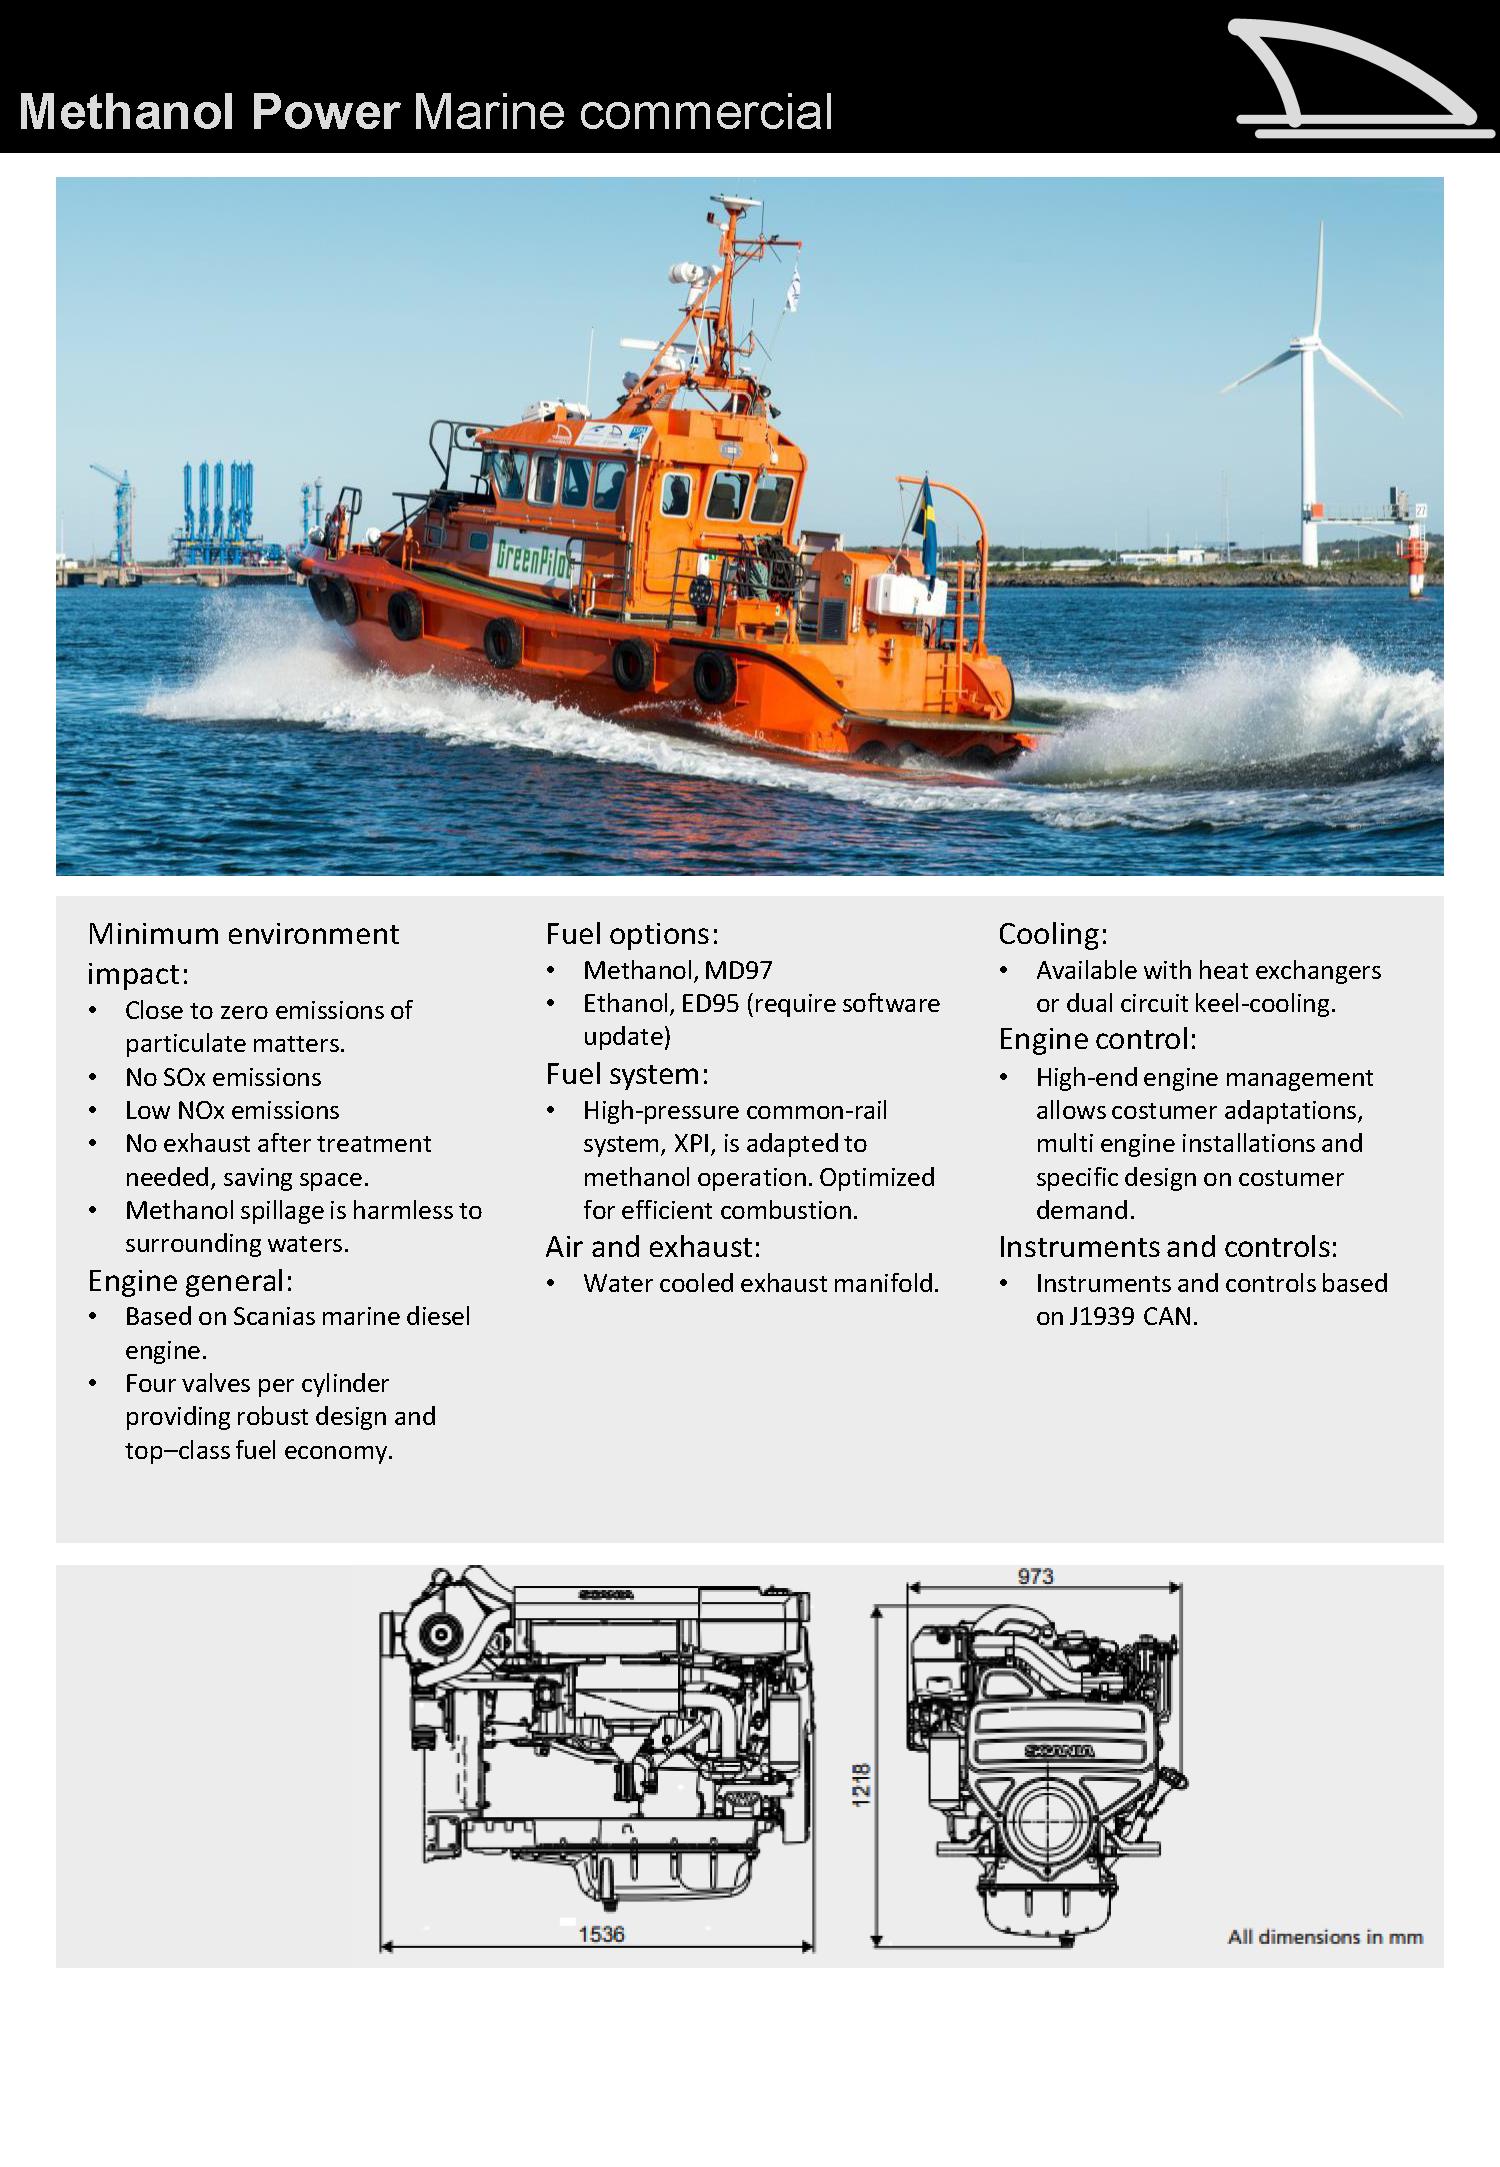 Metanol 13L - 280 kW (375 Hp)